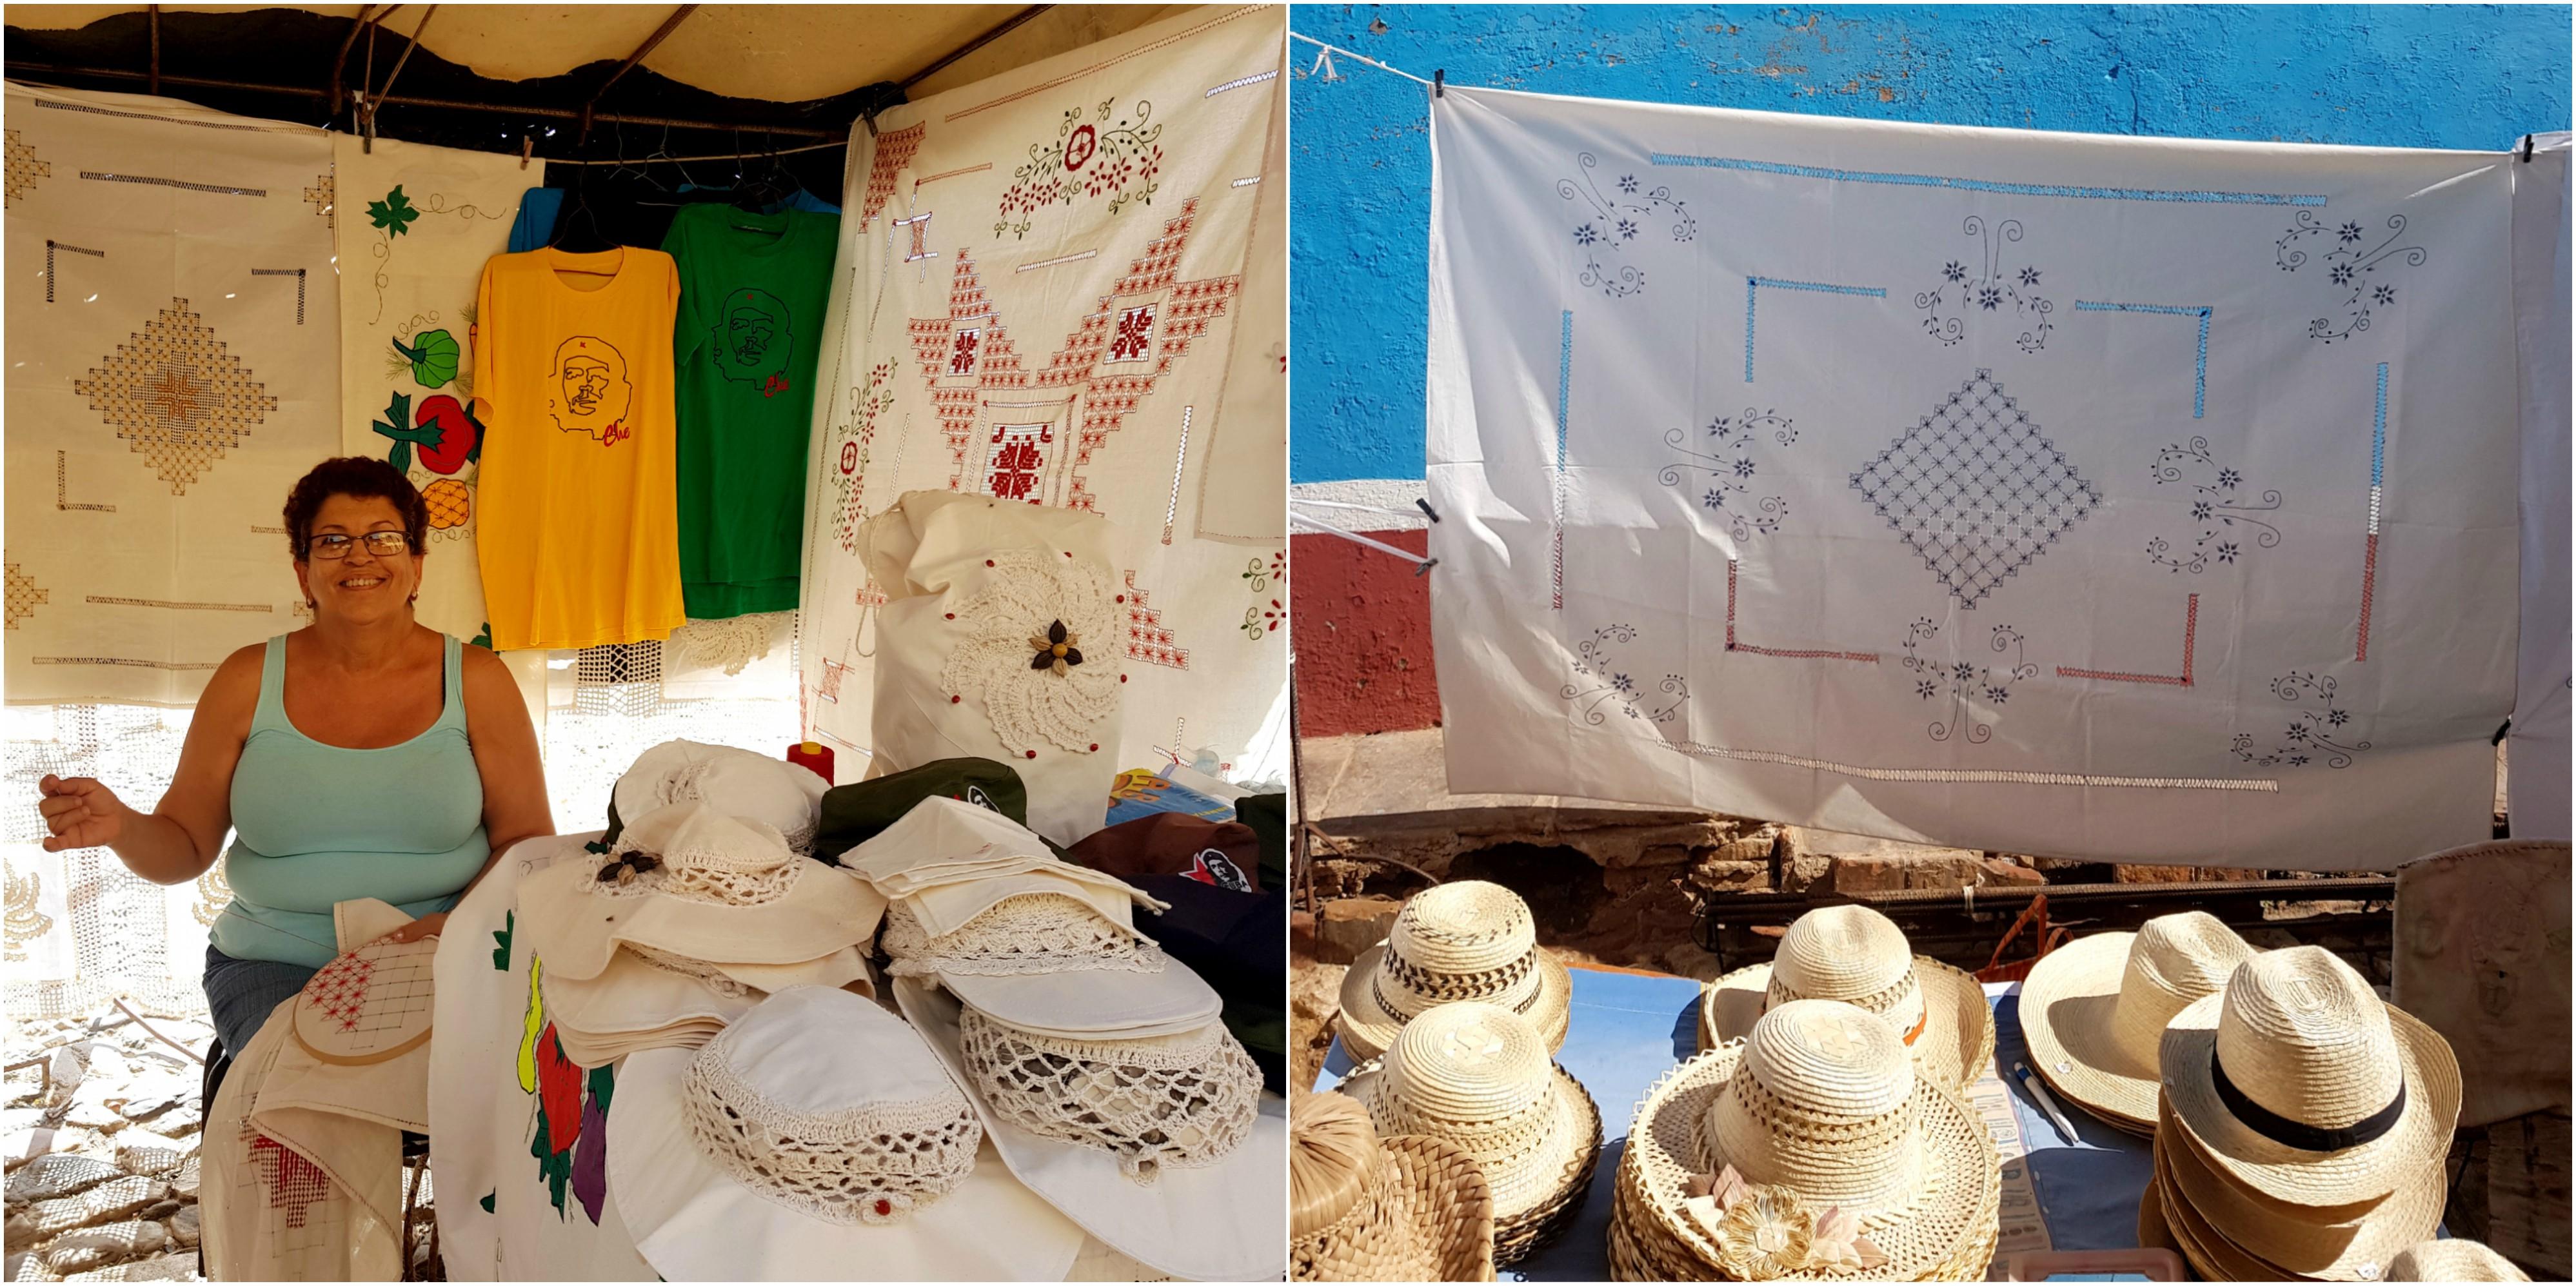 cuba-trinidad-marché-artisanat-broderie-souvenir